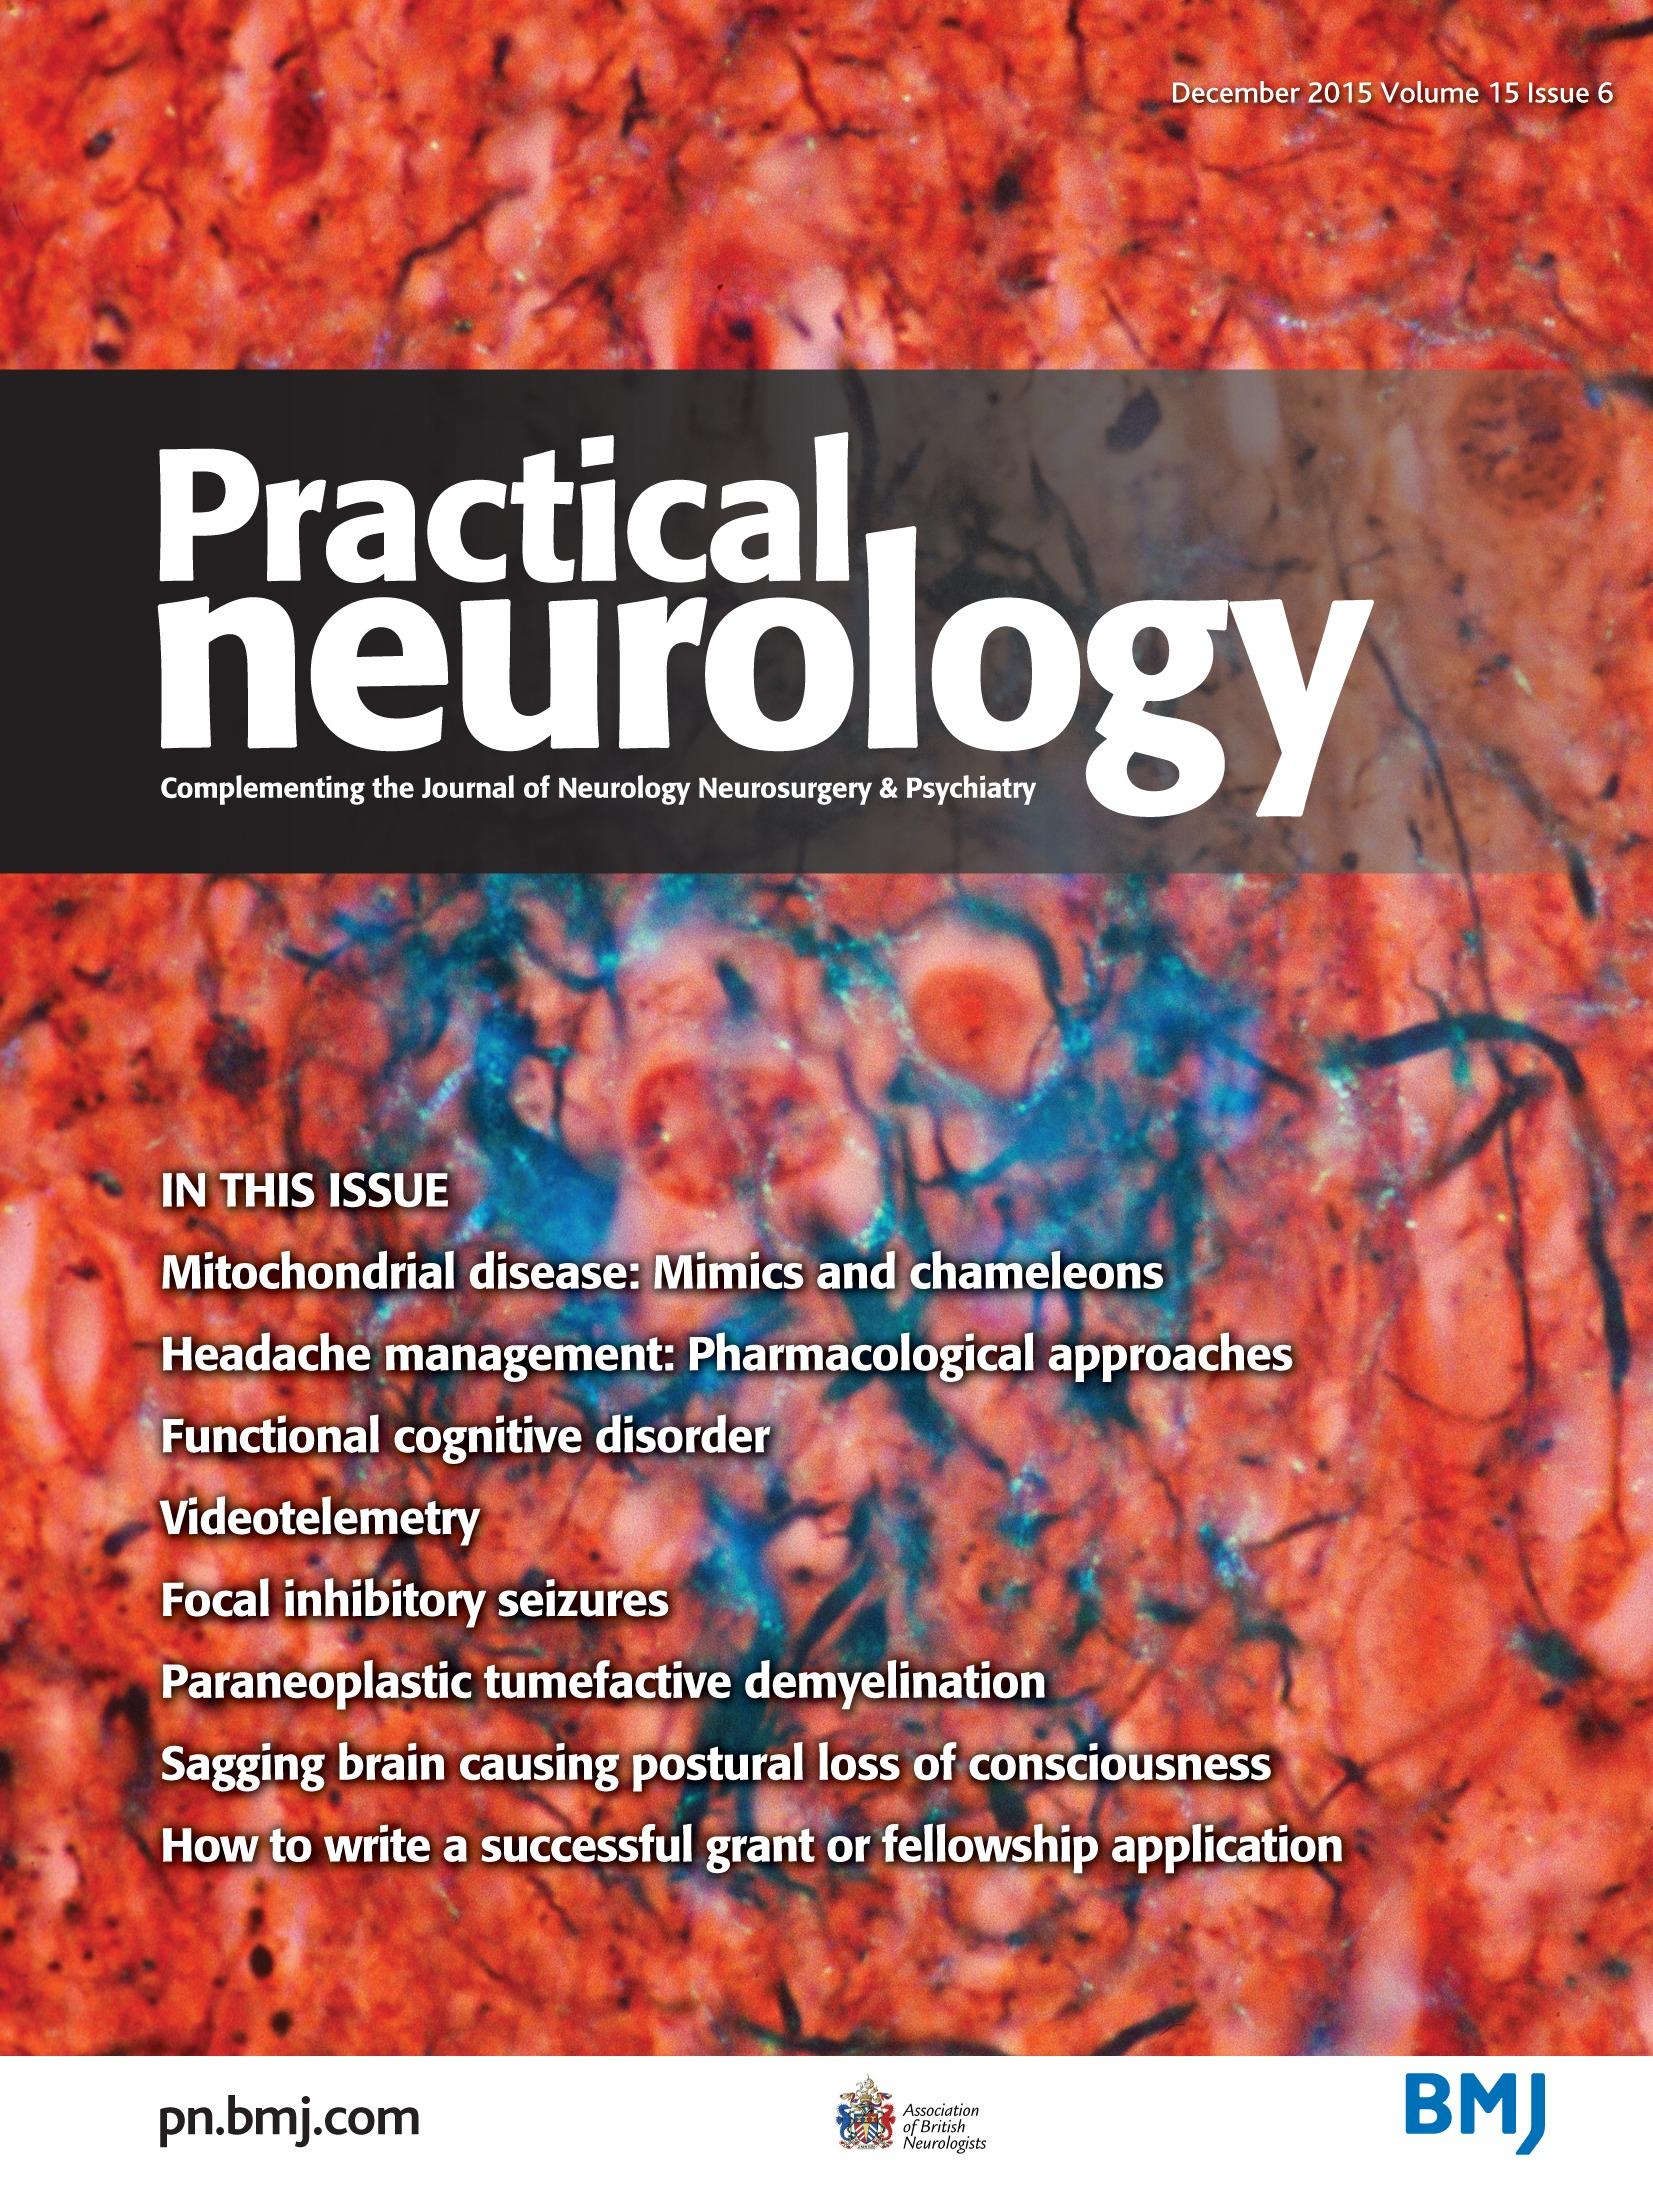 Headache management: pharmacological approaches | Practical Neurology